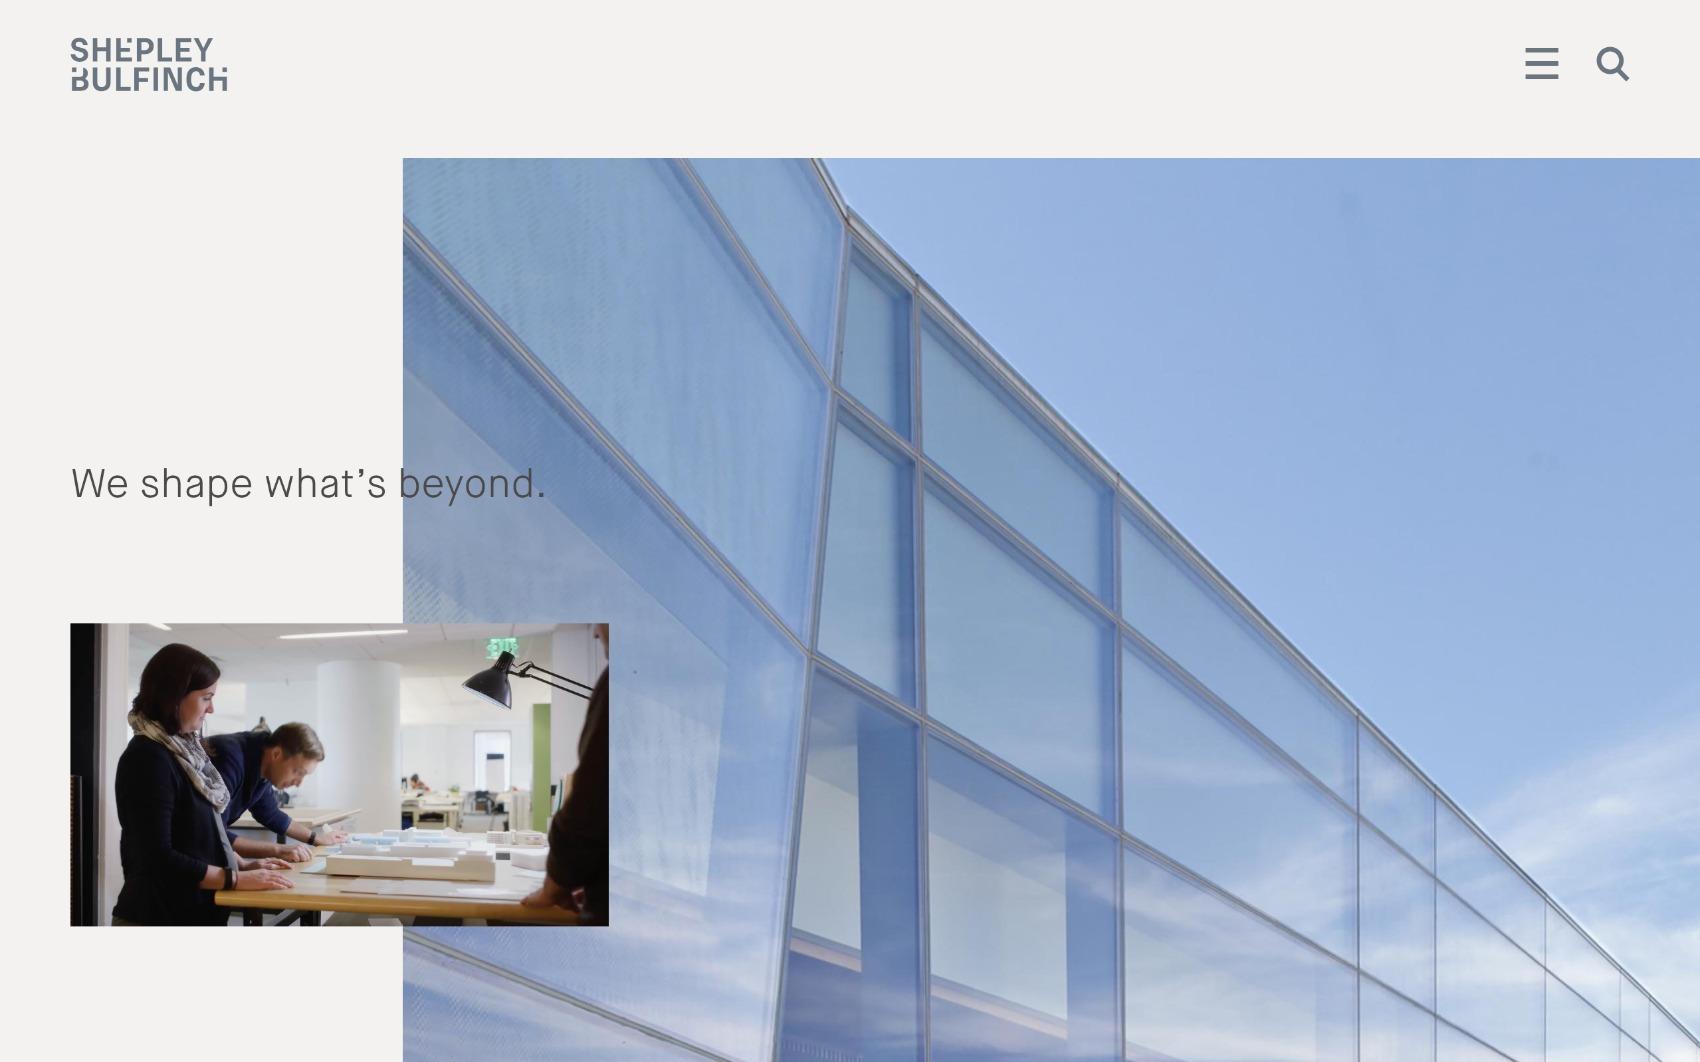 best architecture firm websites. shepley bulfinch